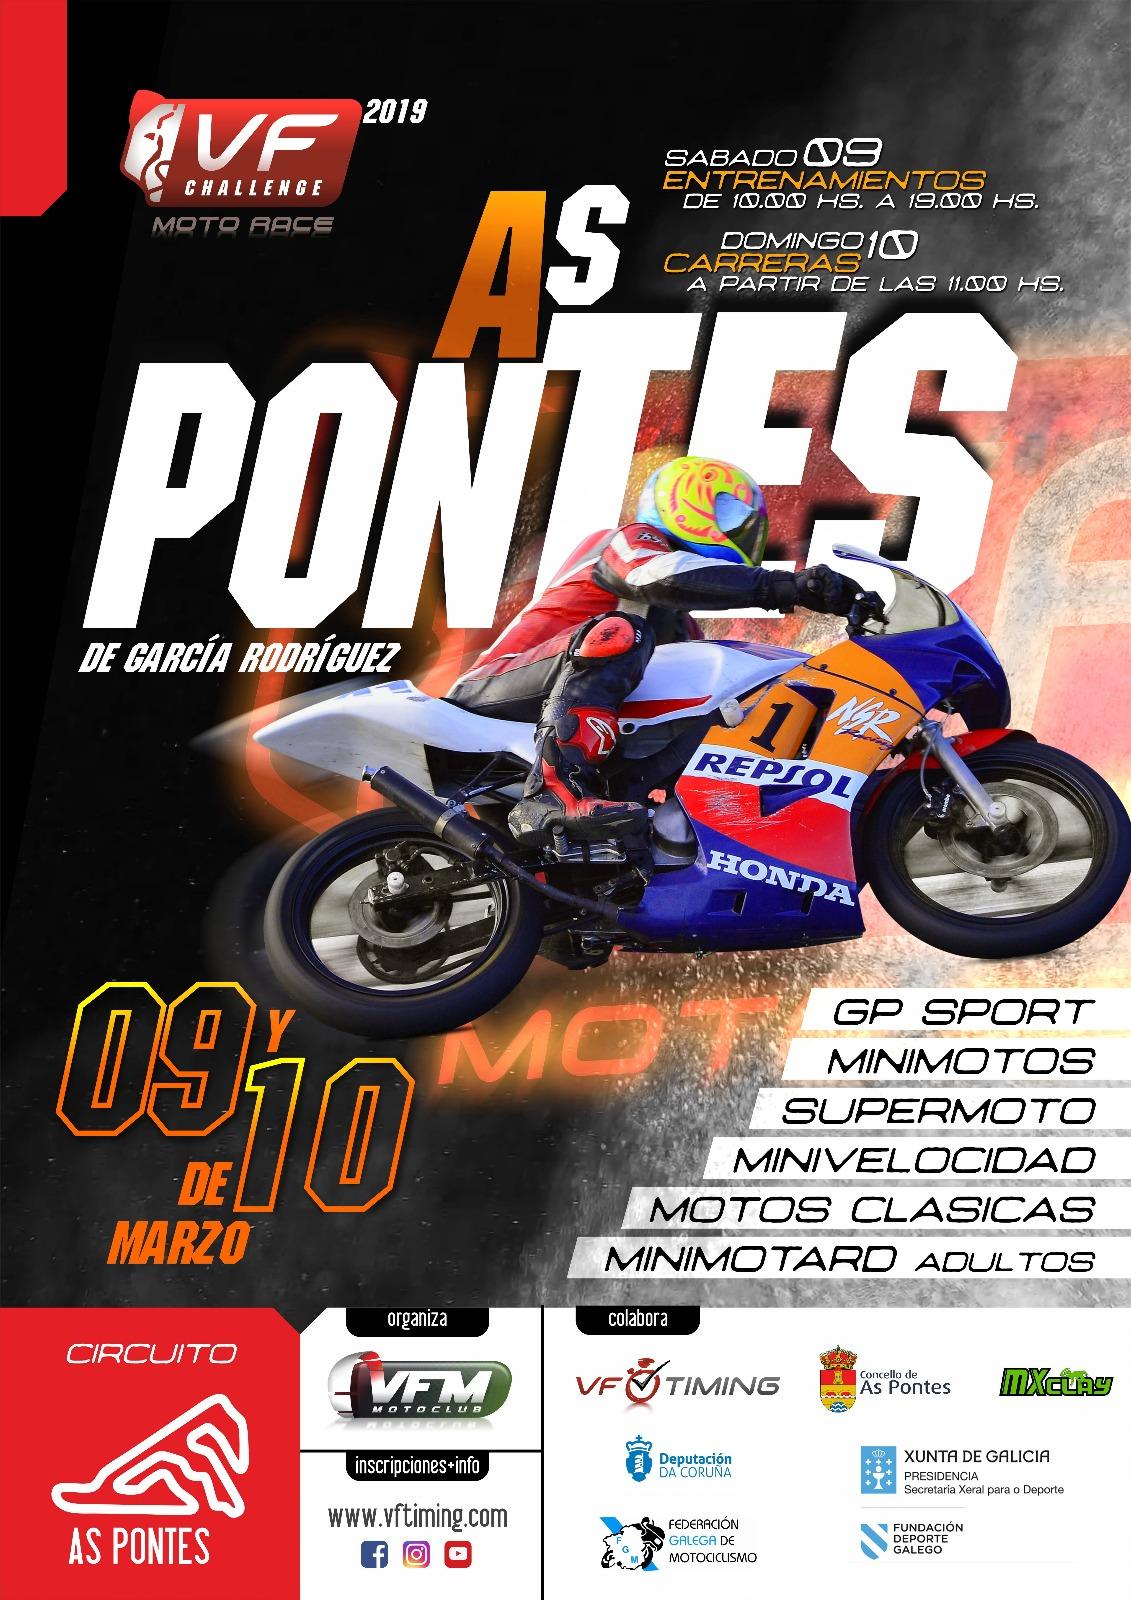 VF Challenge M.R. As Pontes- Cto Galego Velocidade